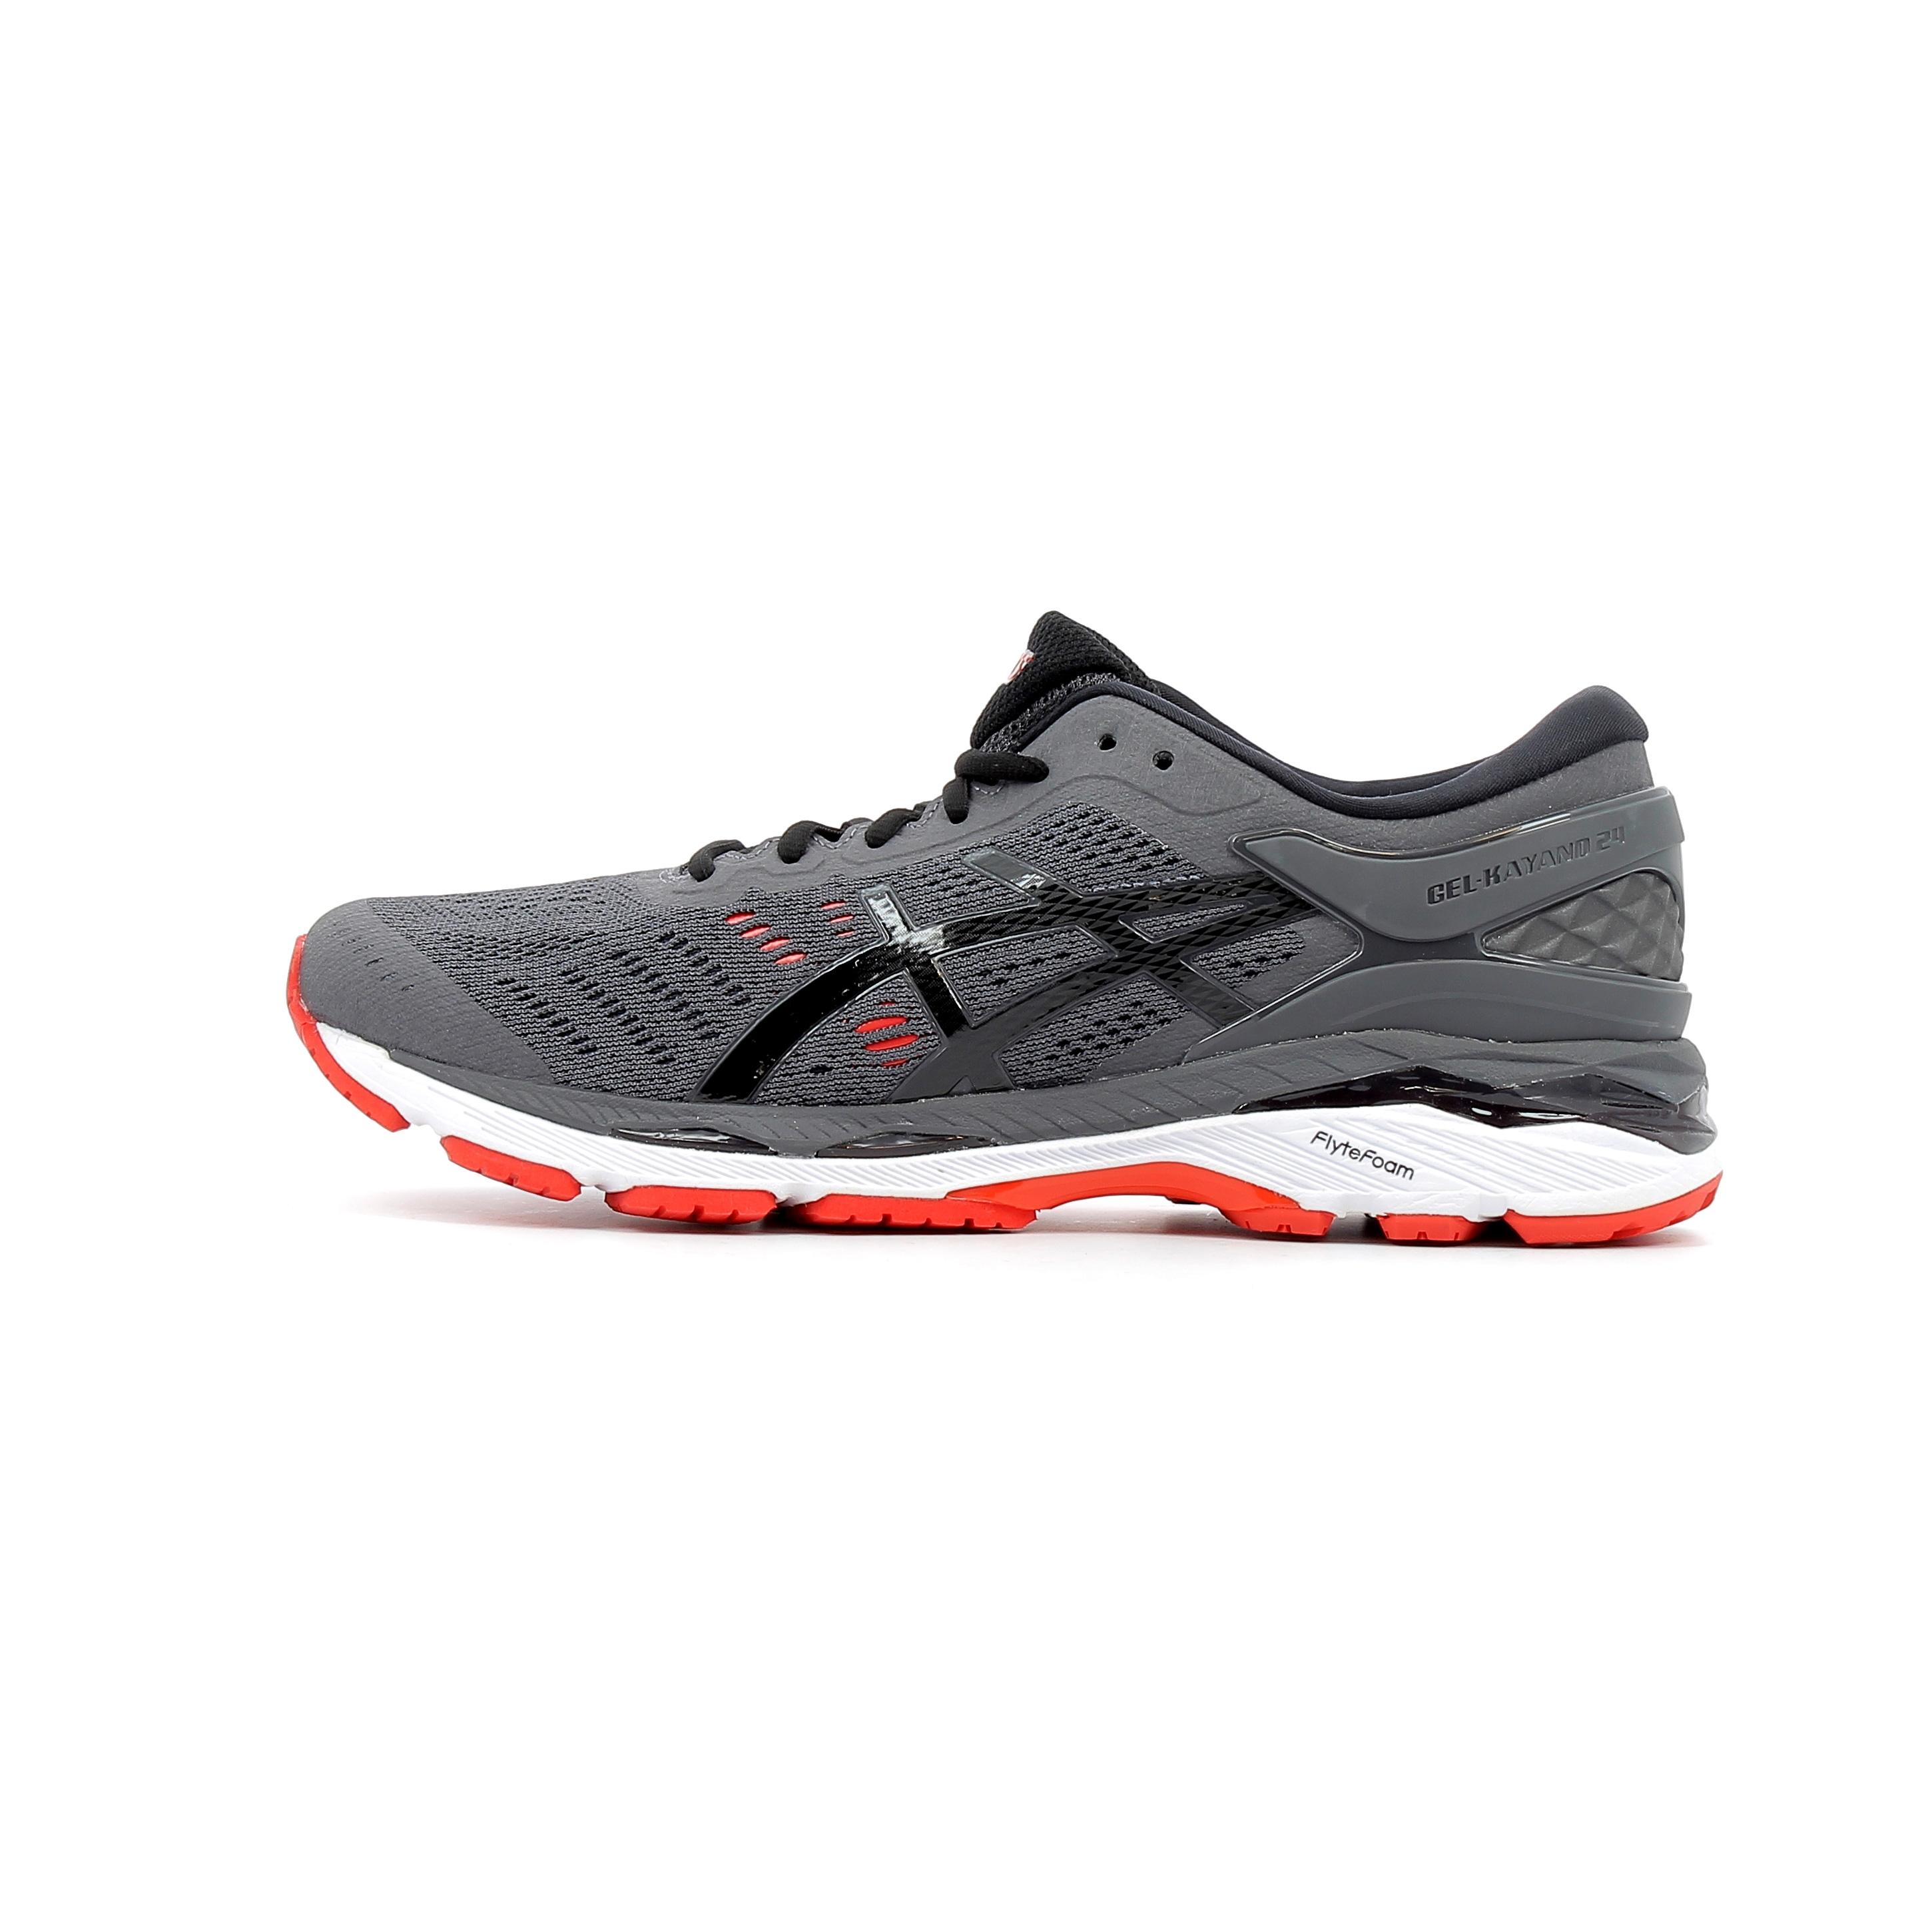 reputable site e882c 67f1b Chaussures de Running Asics Gel Kayano 24 Gris